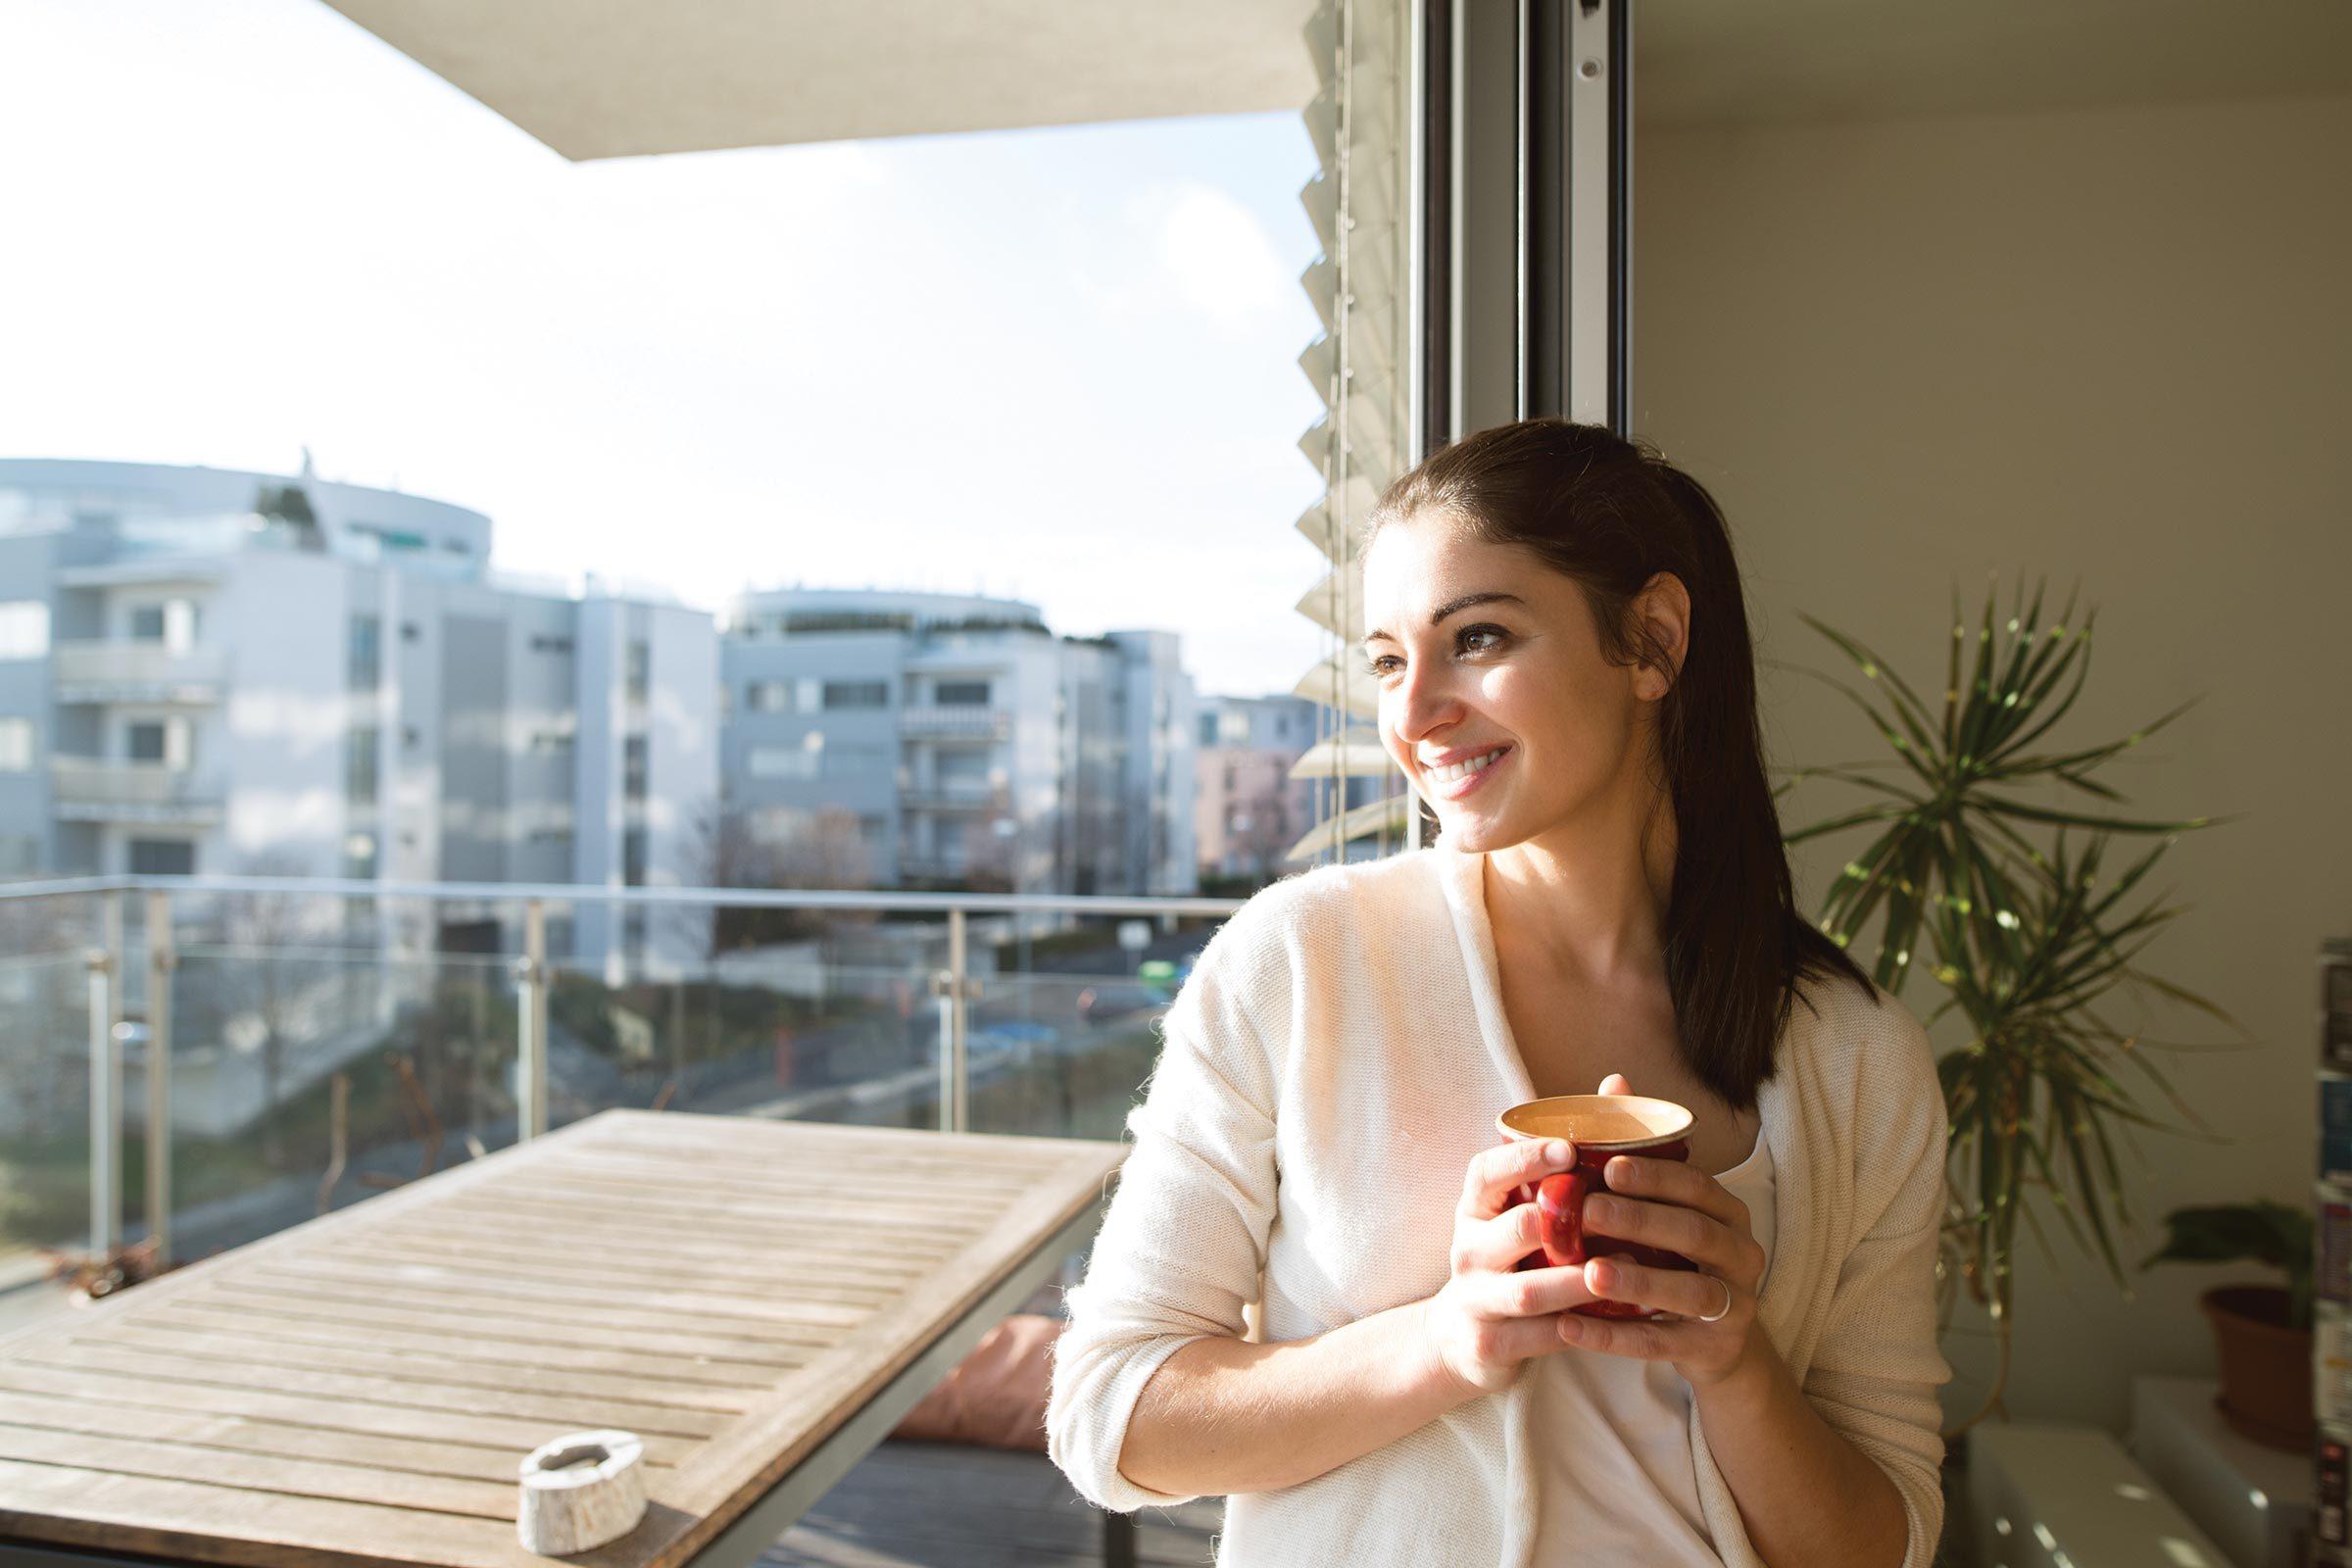 woman relax cup balcony sun